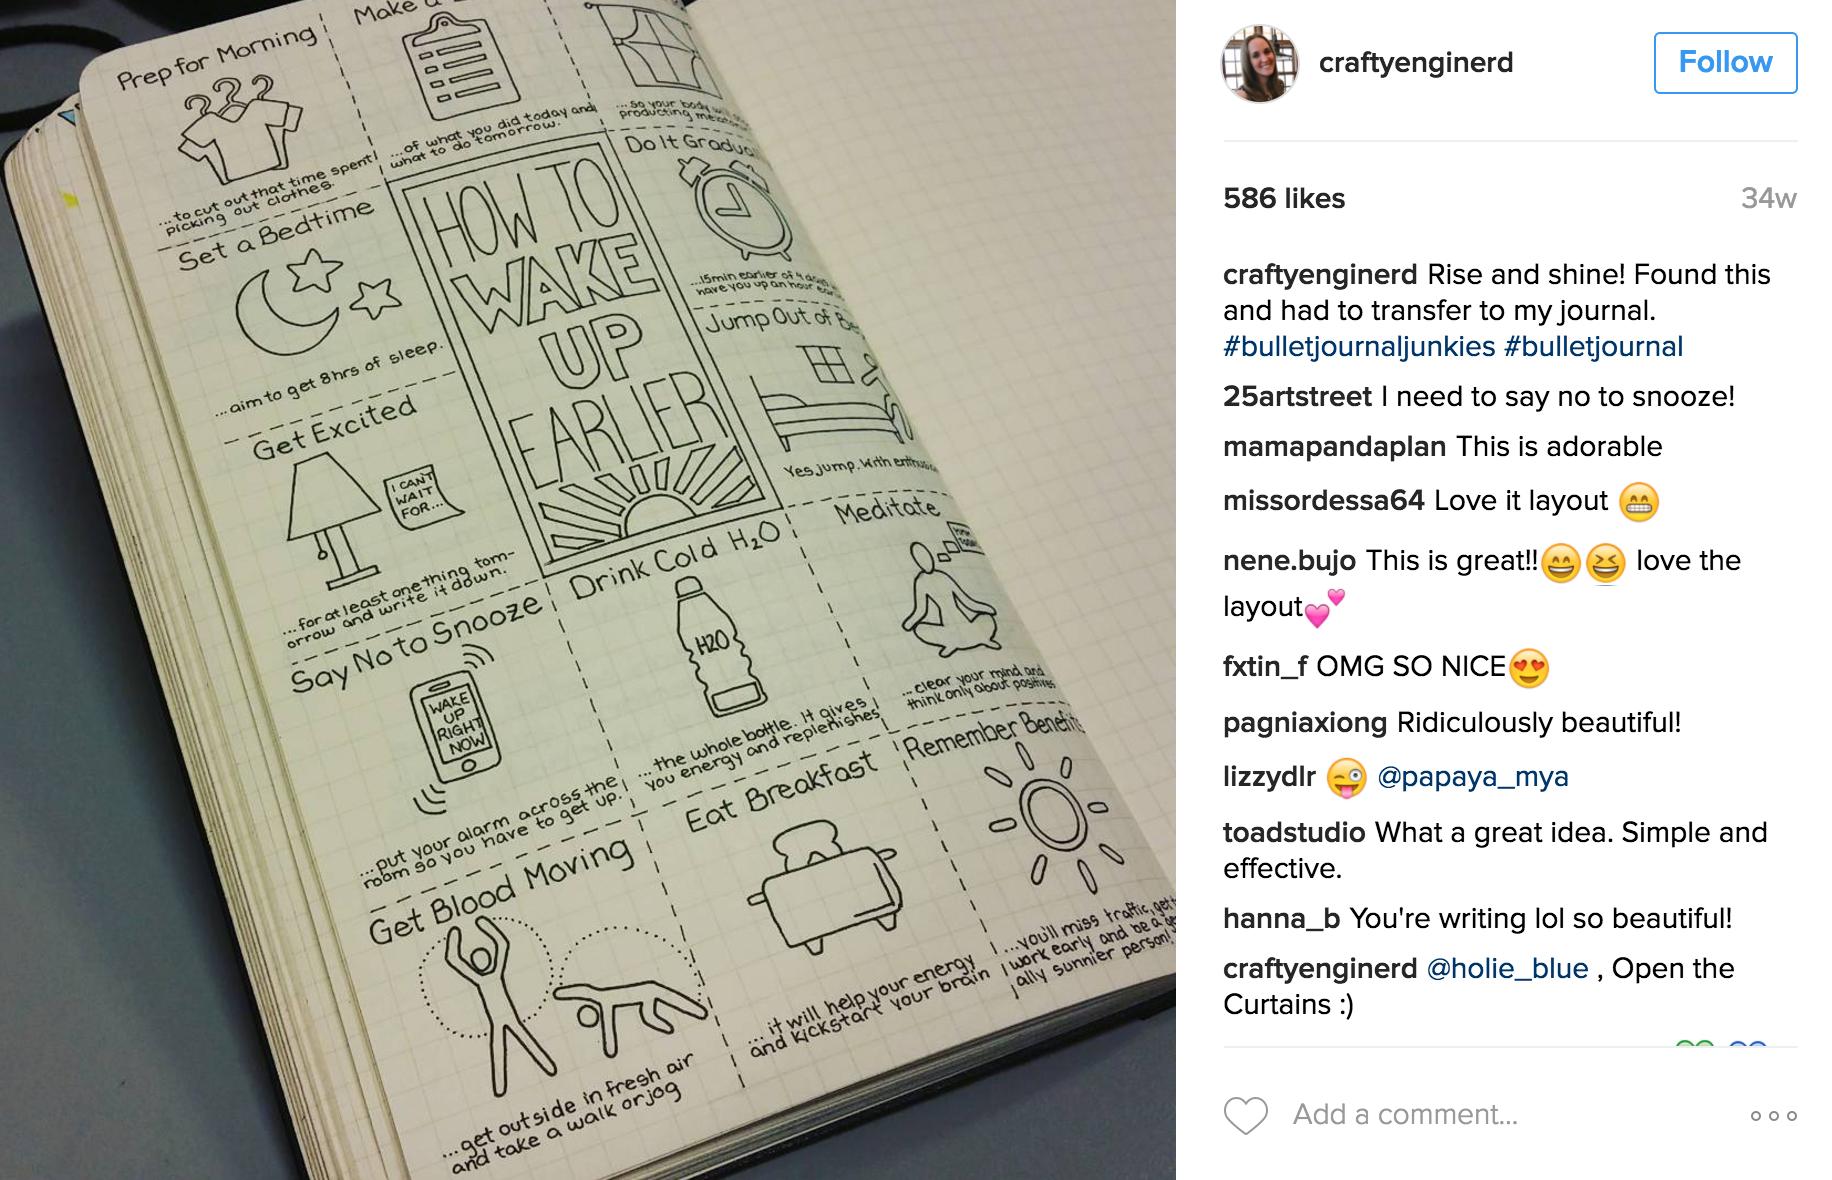 Source: craftyenginerd Instagram